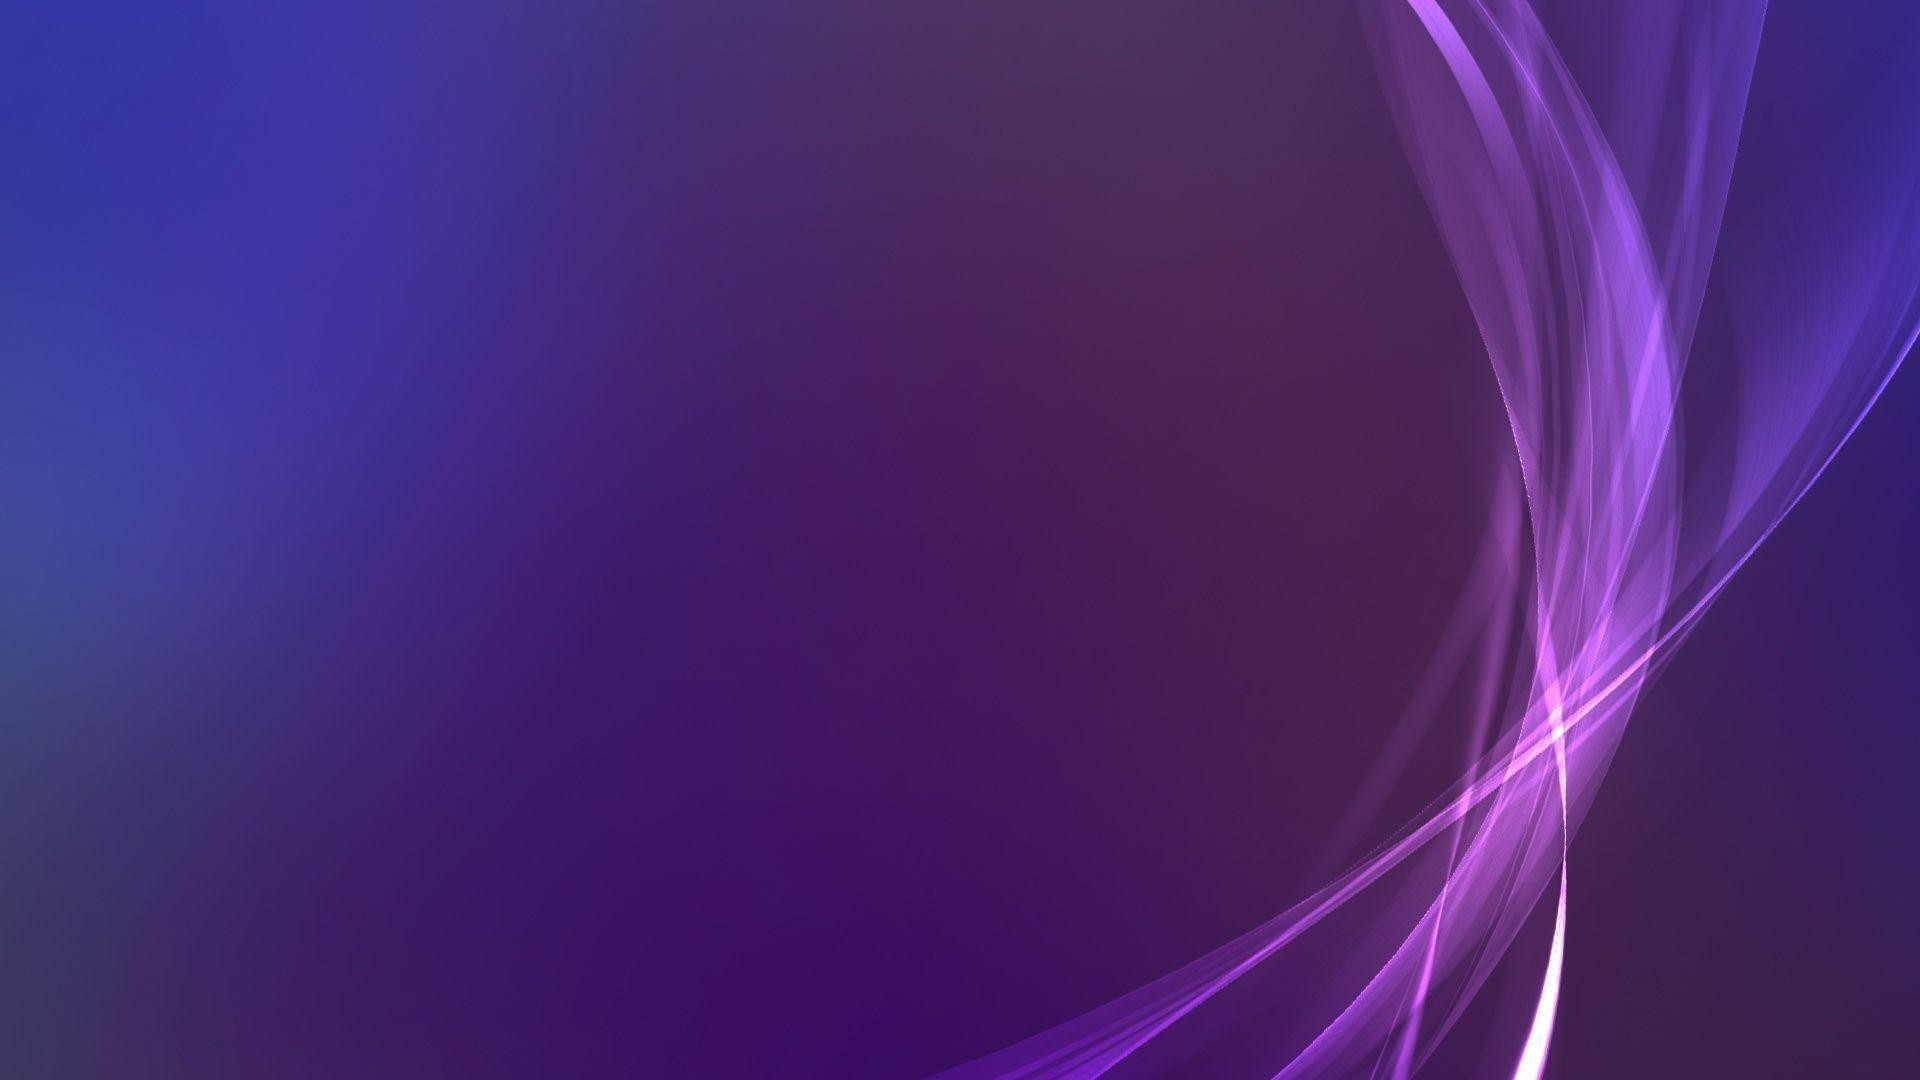 Dark <b>Purple Background Wallpaper</b> – WallpaperSafari